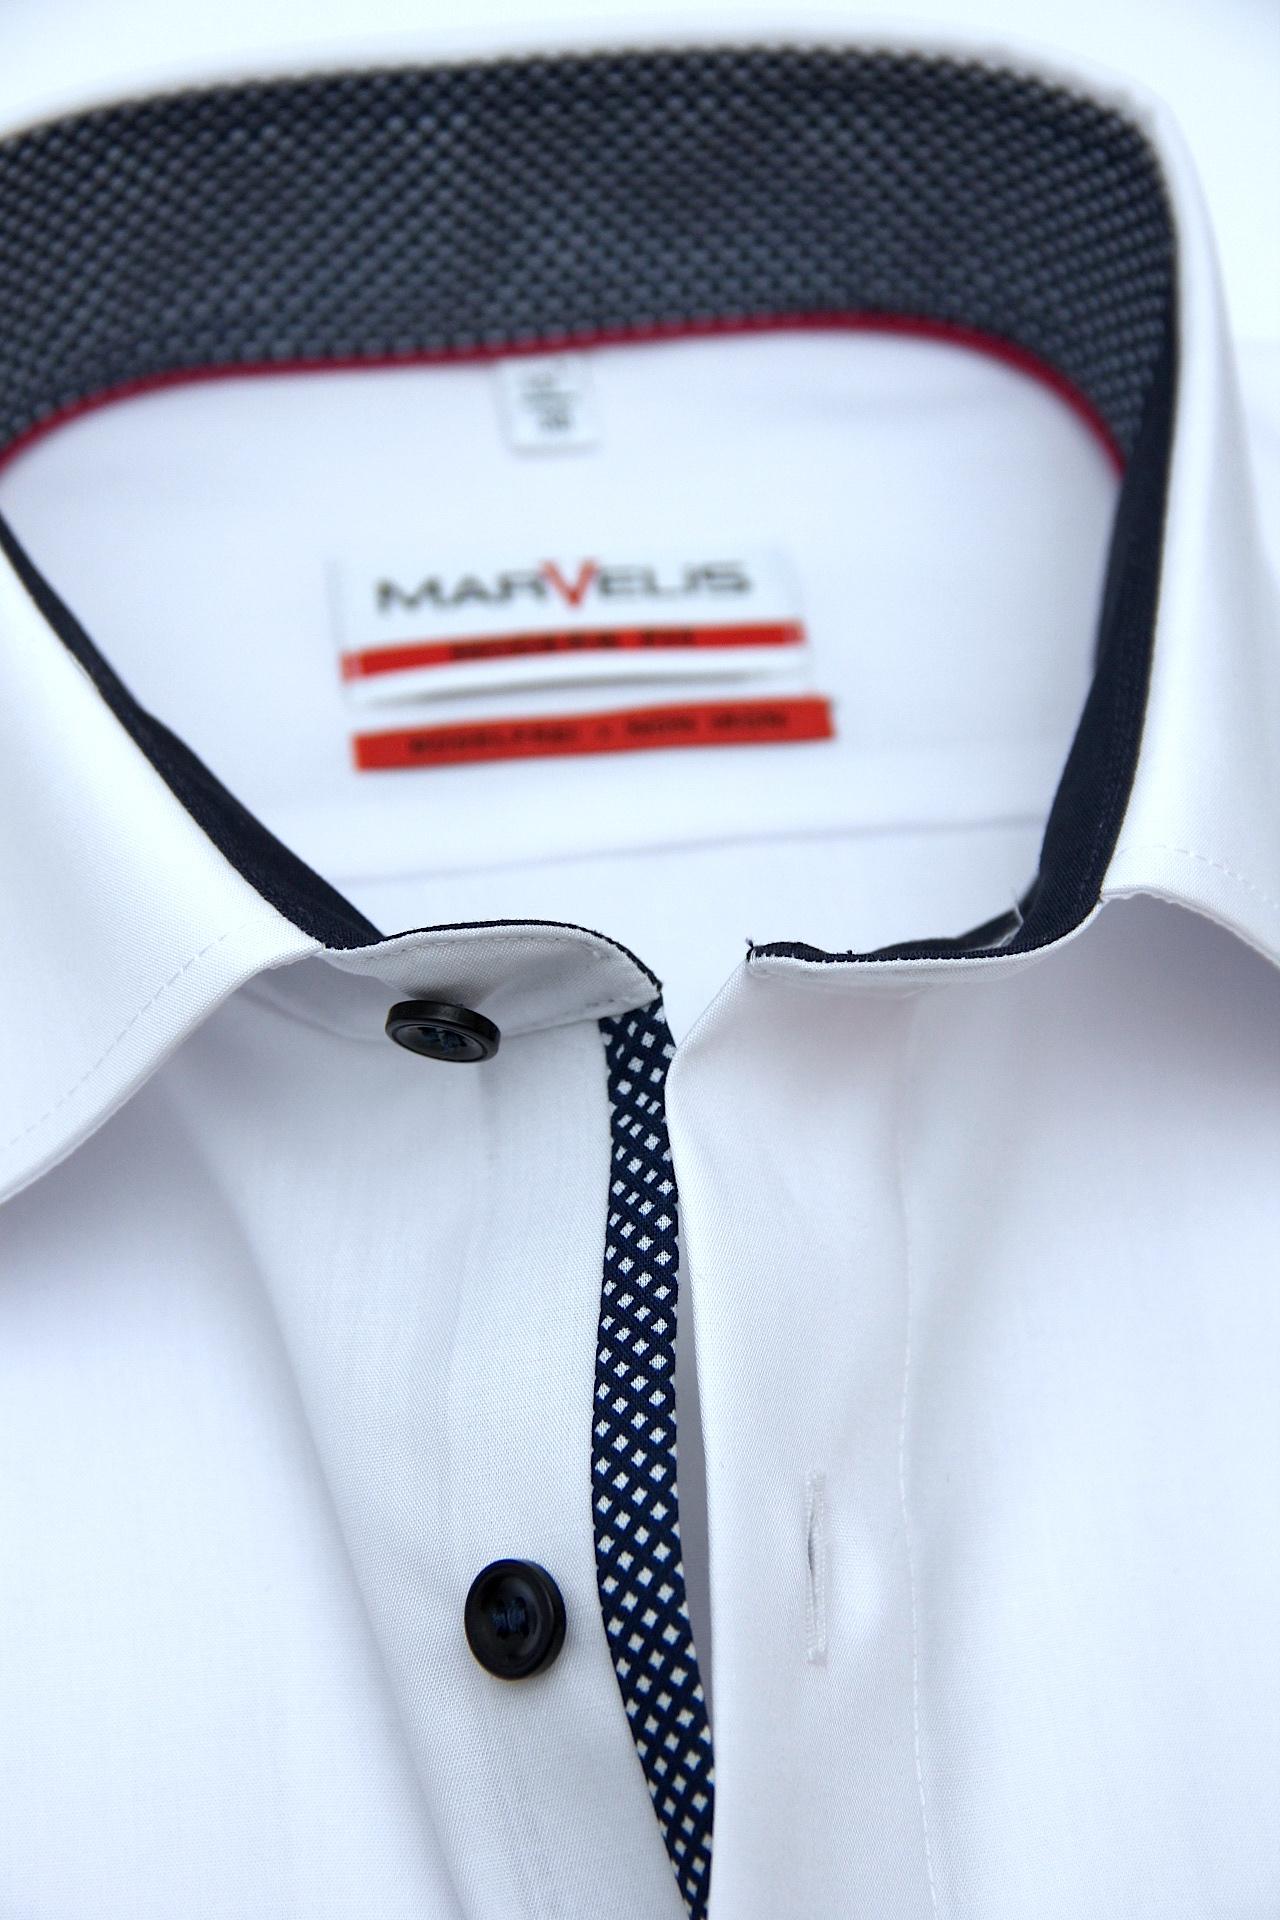 Marvelis-hemd 7225-12-11 Modern-fit Halbarm Blue Kleidung & Accessoires